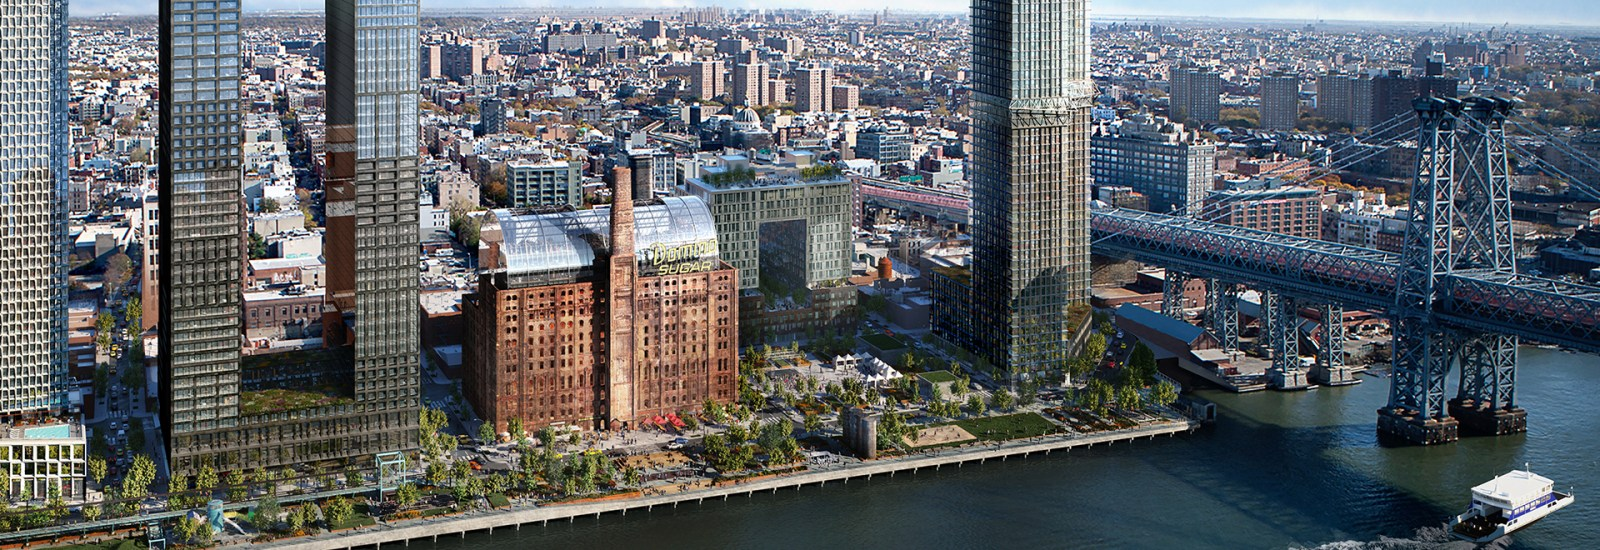 Urban renewal at the Domino Park development in Brooklyn